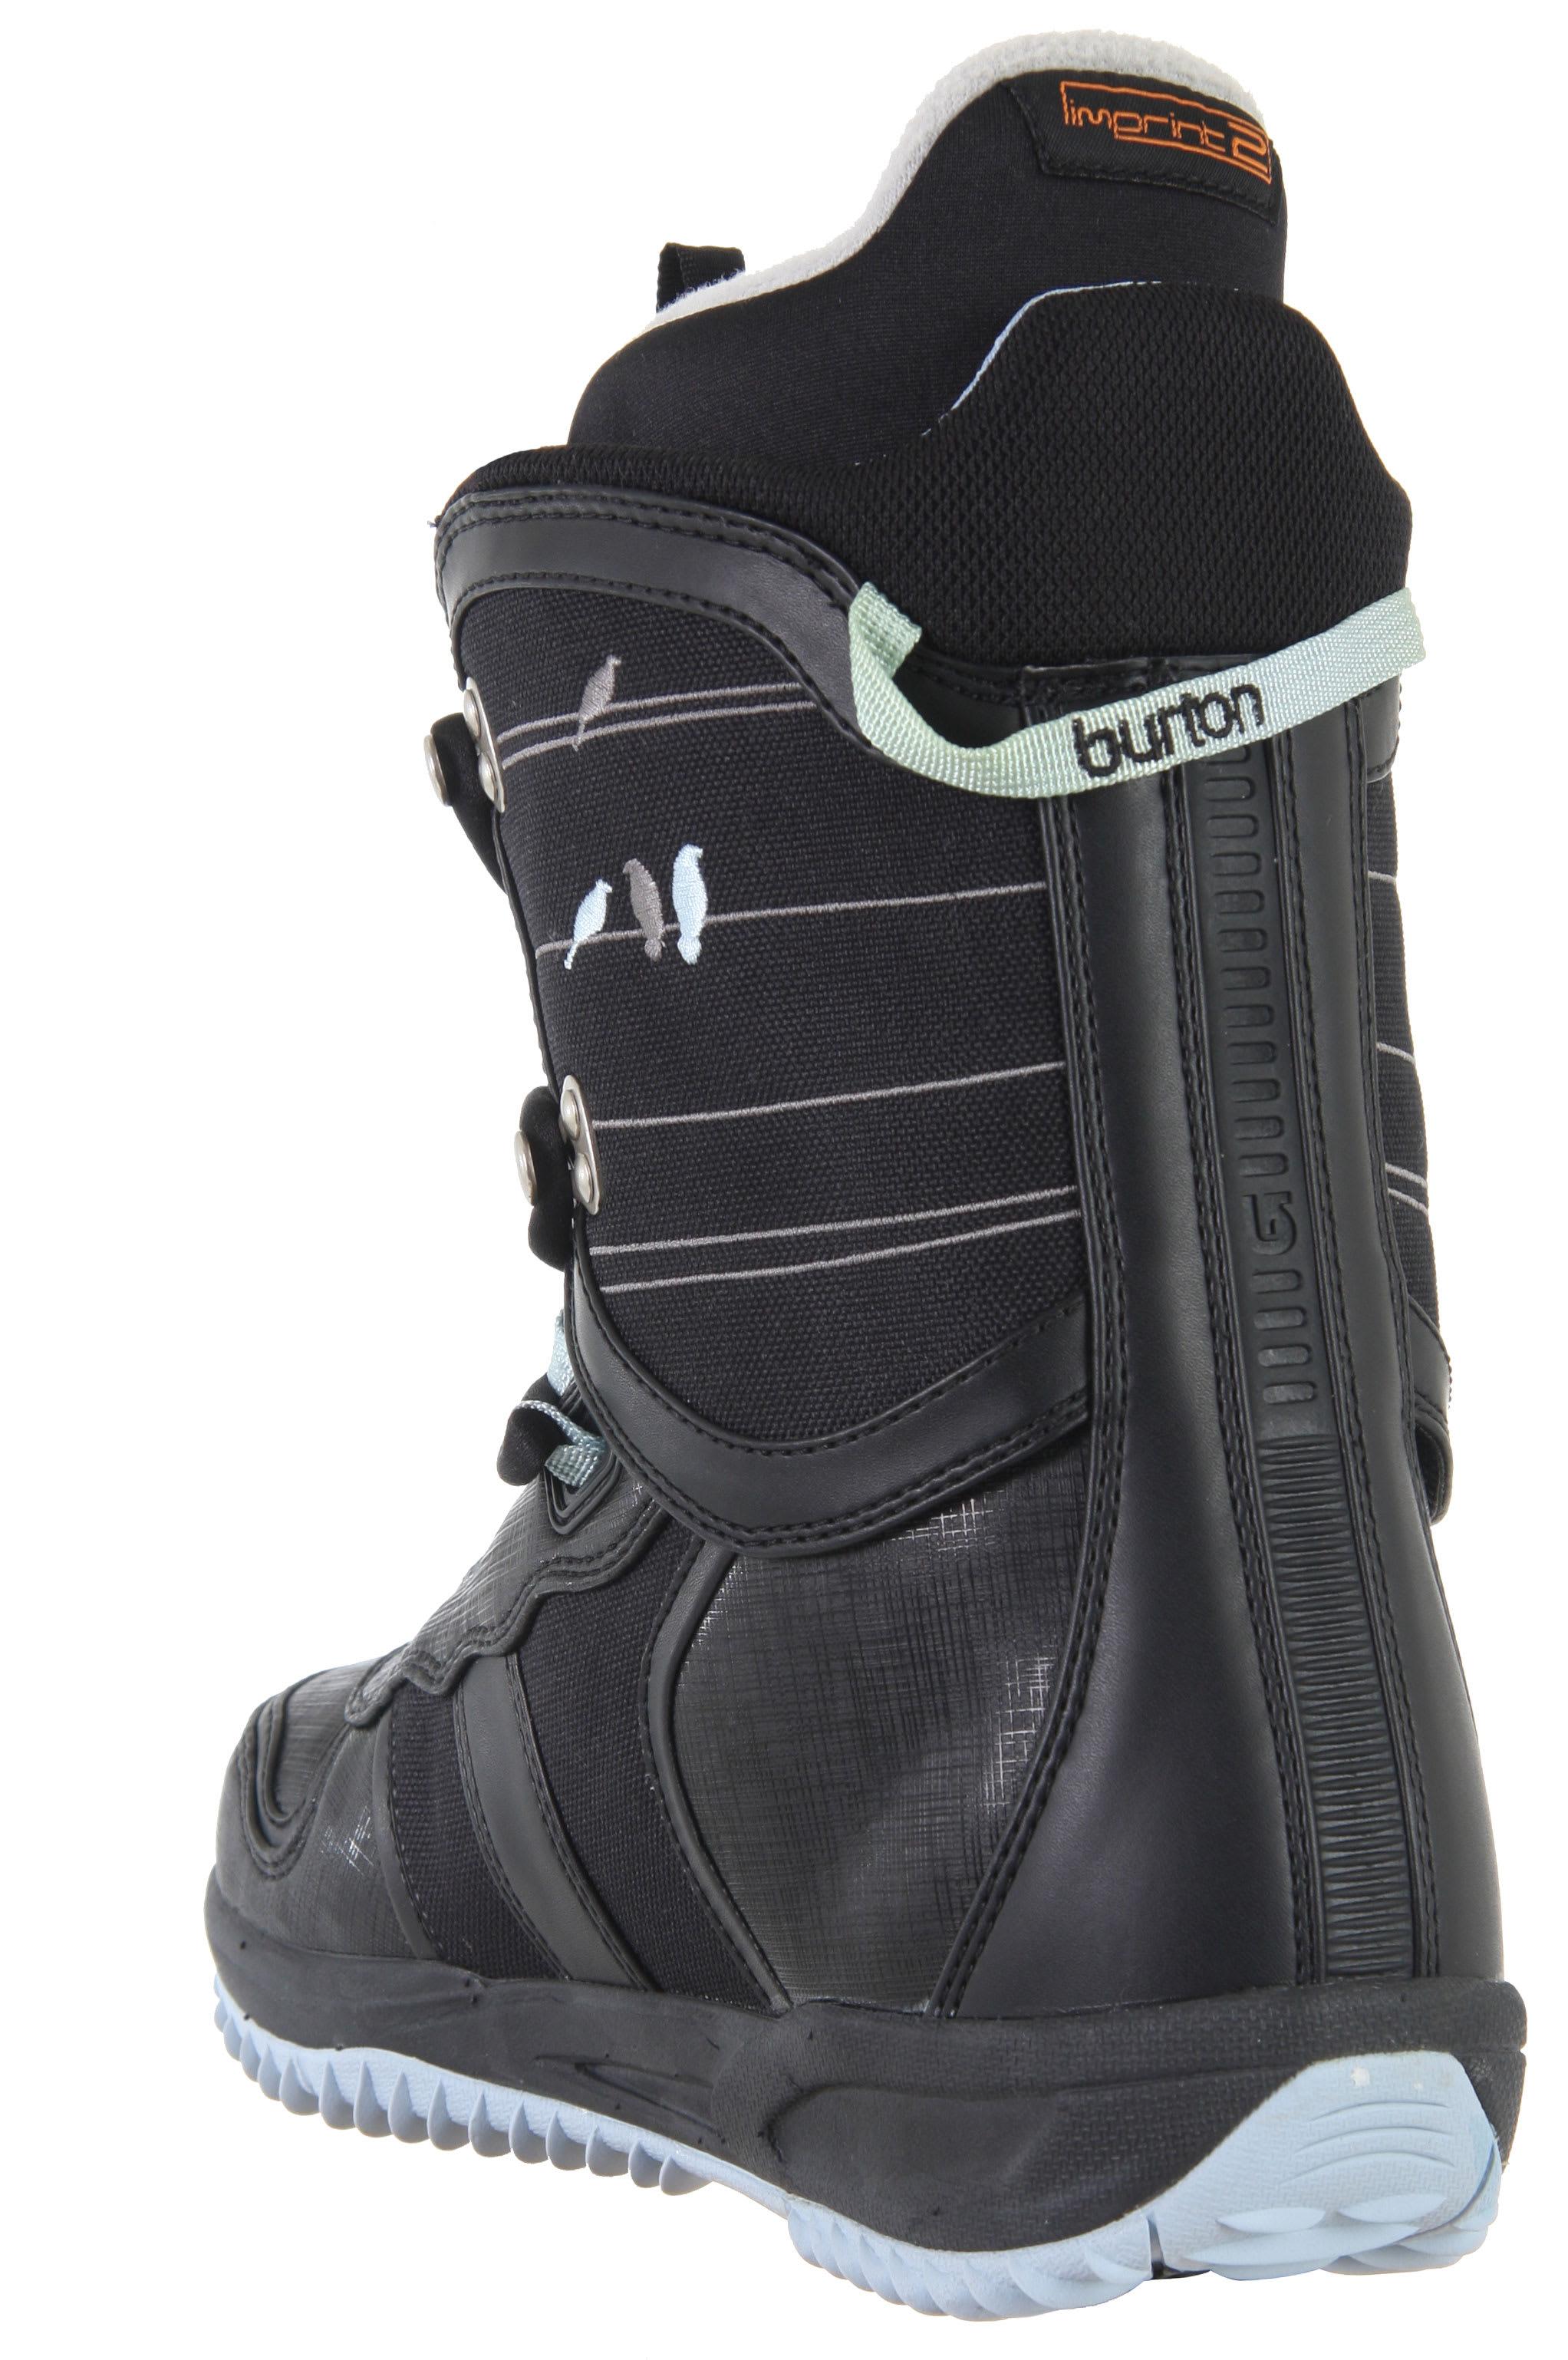 Ski Boots Sale >> Burton Lodi Snowboard Boots - Womens